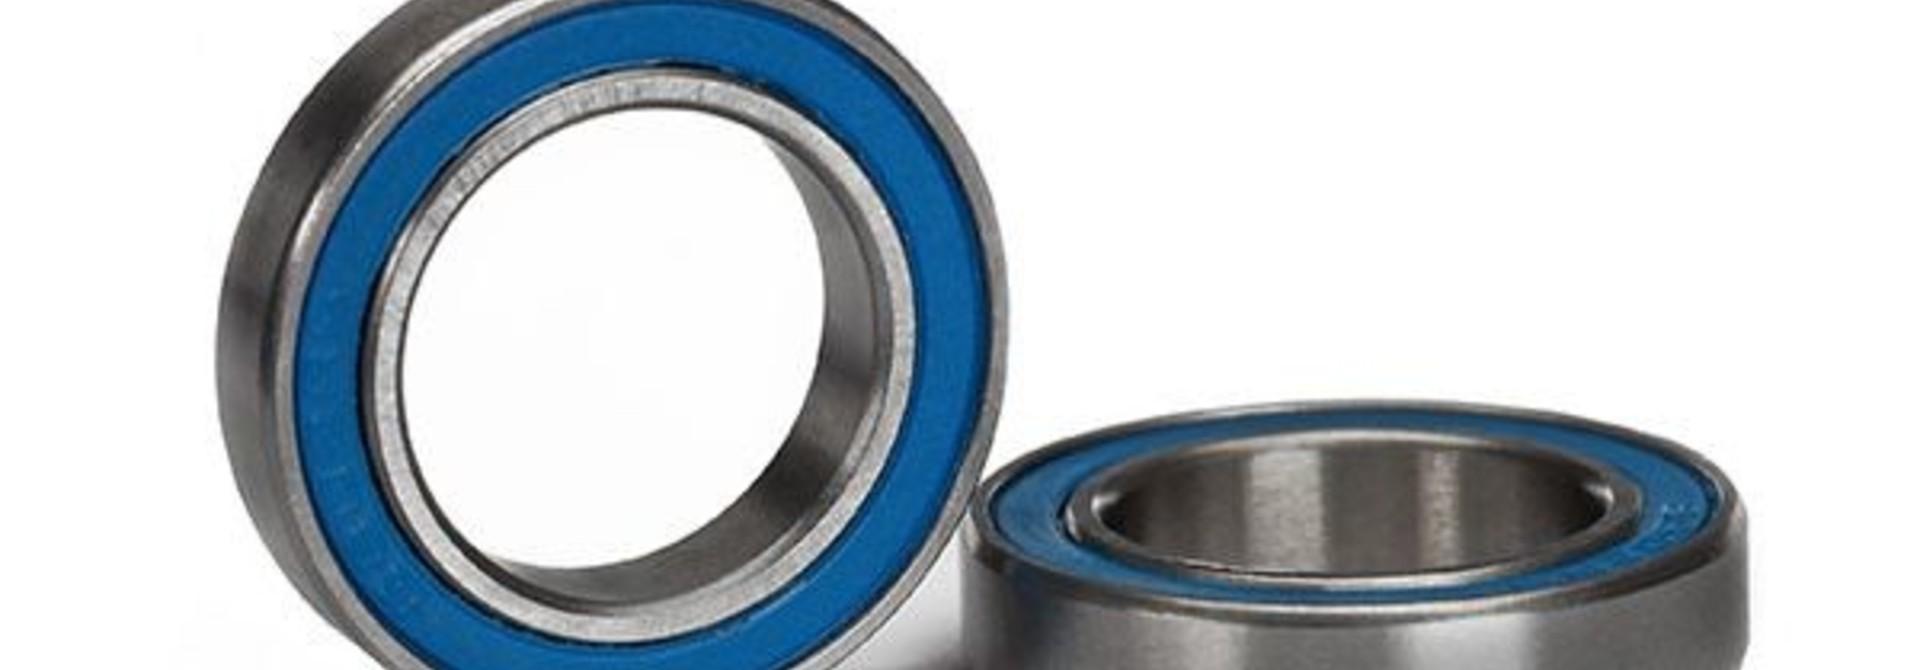 Ball bearing, blue rubber sealed (15x24x5mm) (2), TRX5106